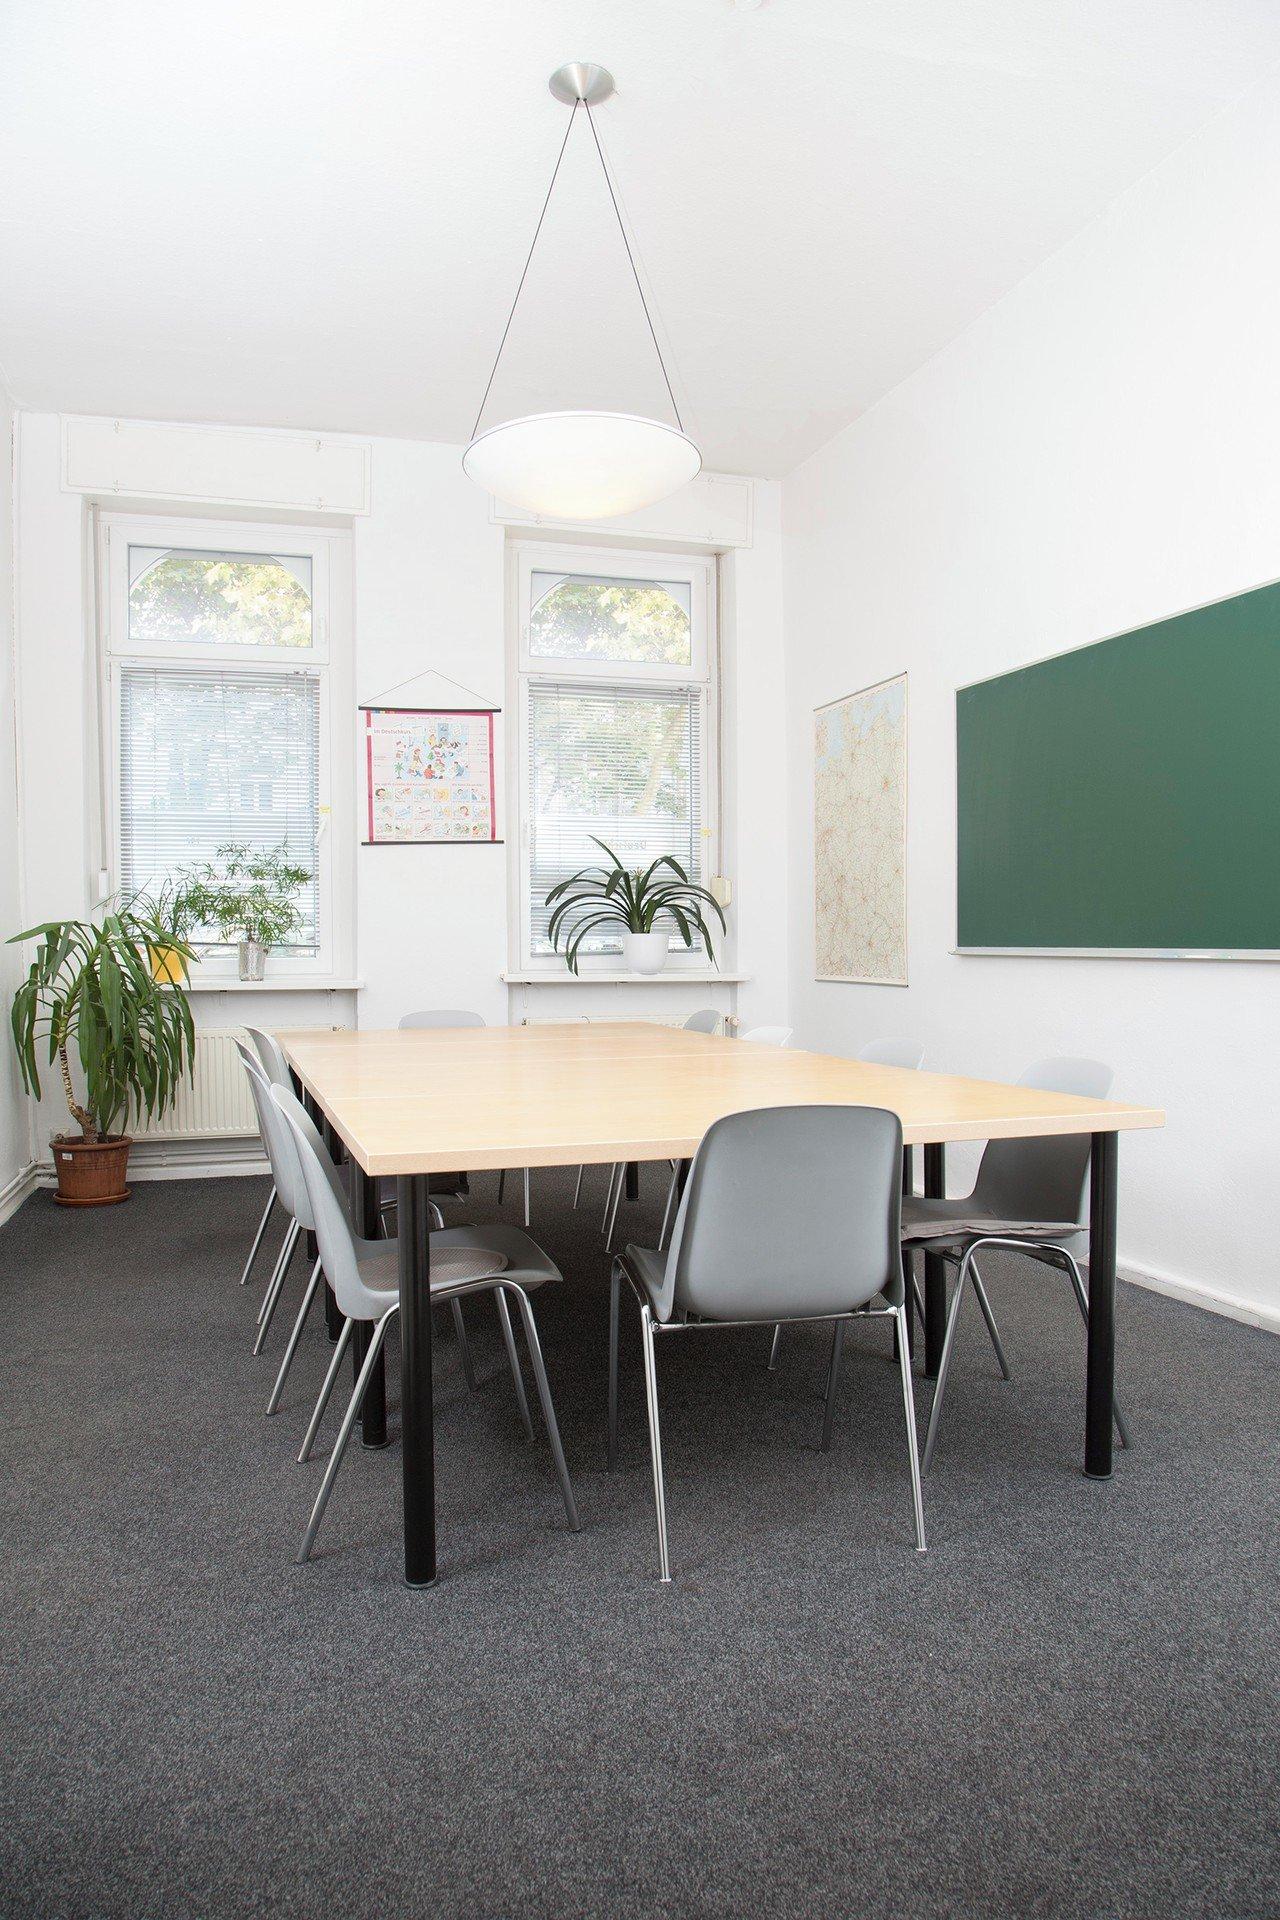 Berlin seminar rooms Meetingraum LOGO Sprachenschule Raum 1 image 0